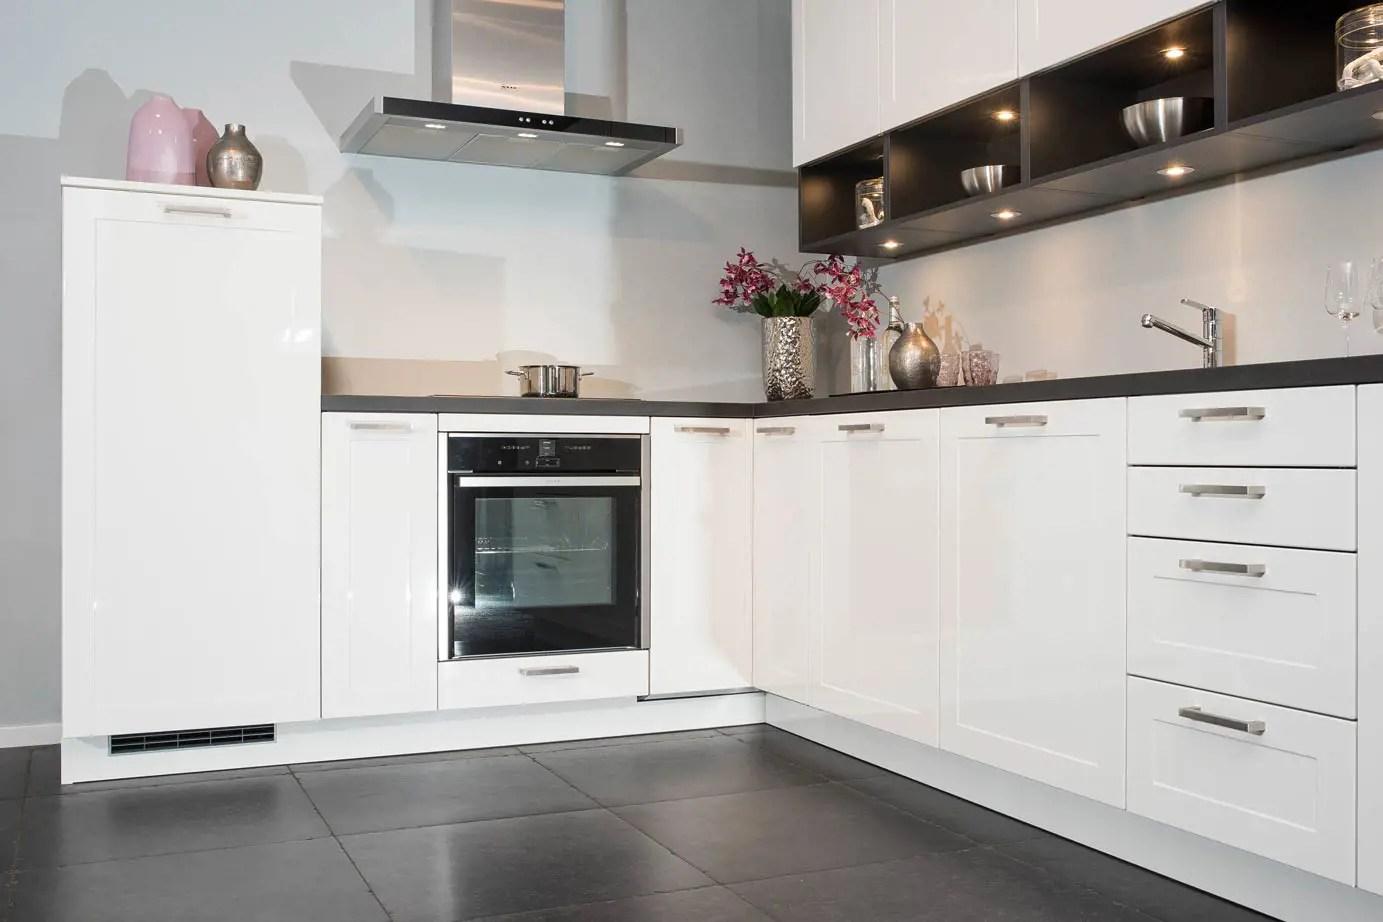 Keuken Apparatuur Merken : Apparatuur keuken merken goedkope keukenapparatuur goedkope db